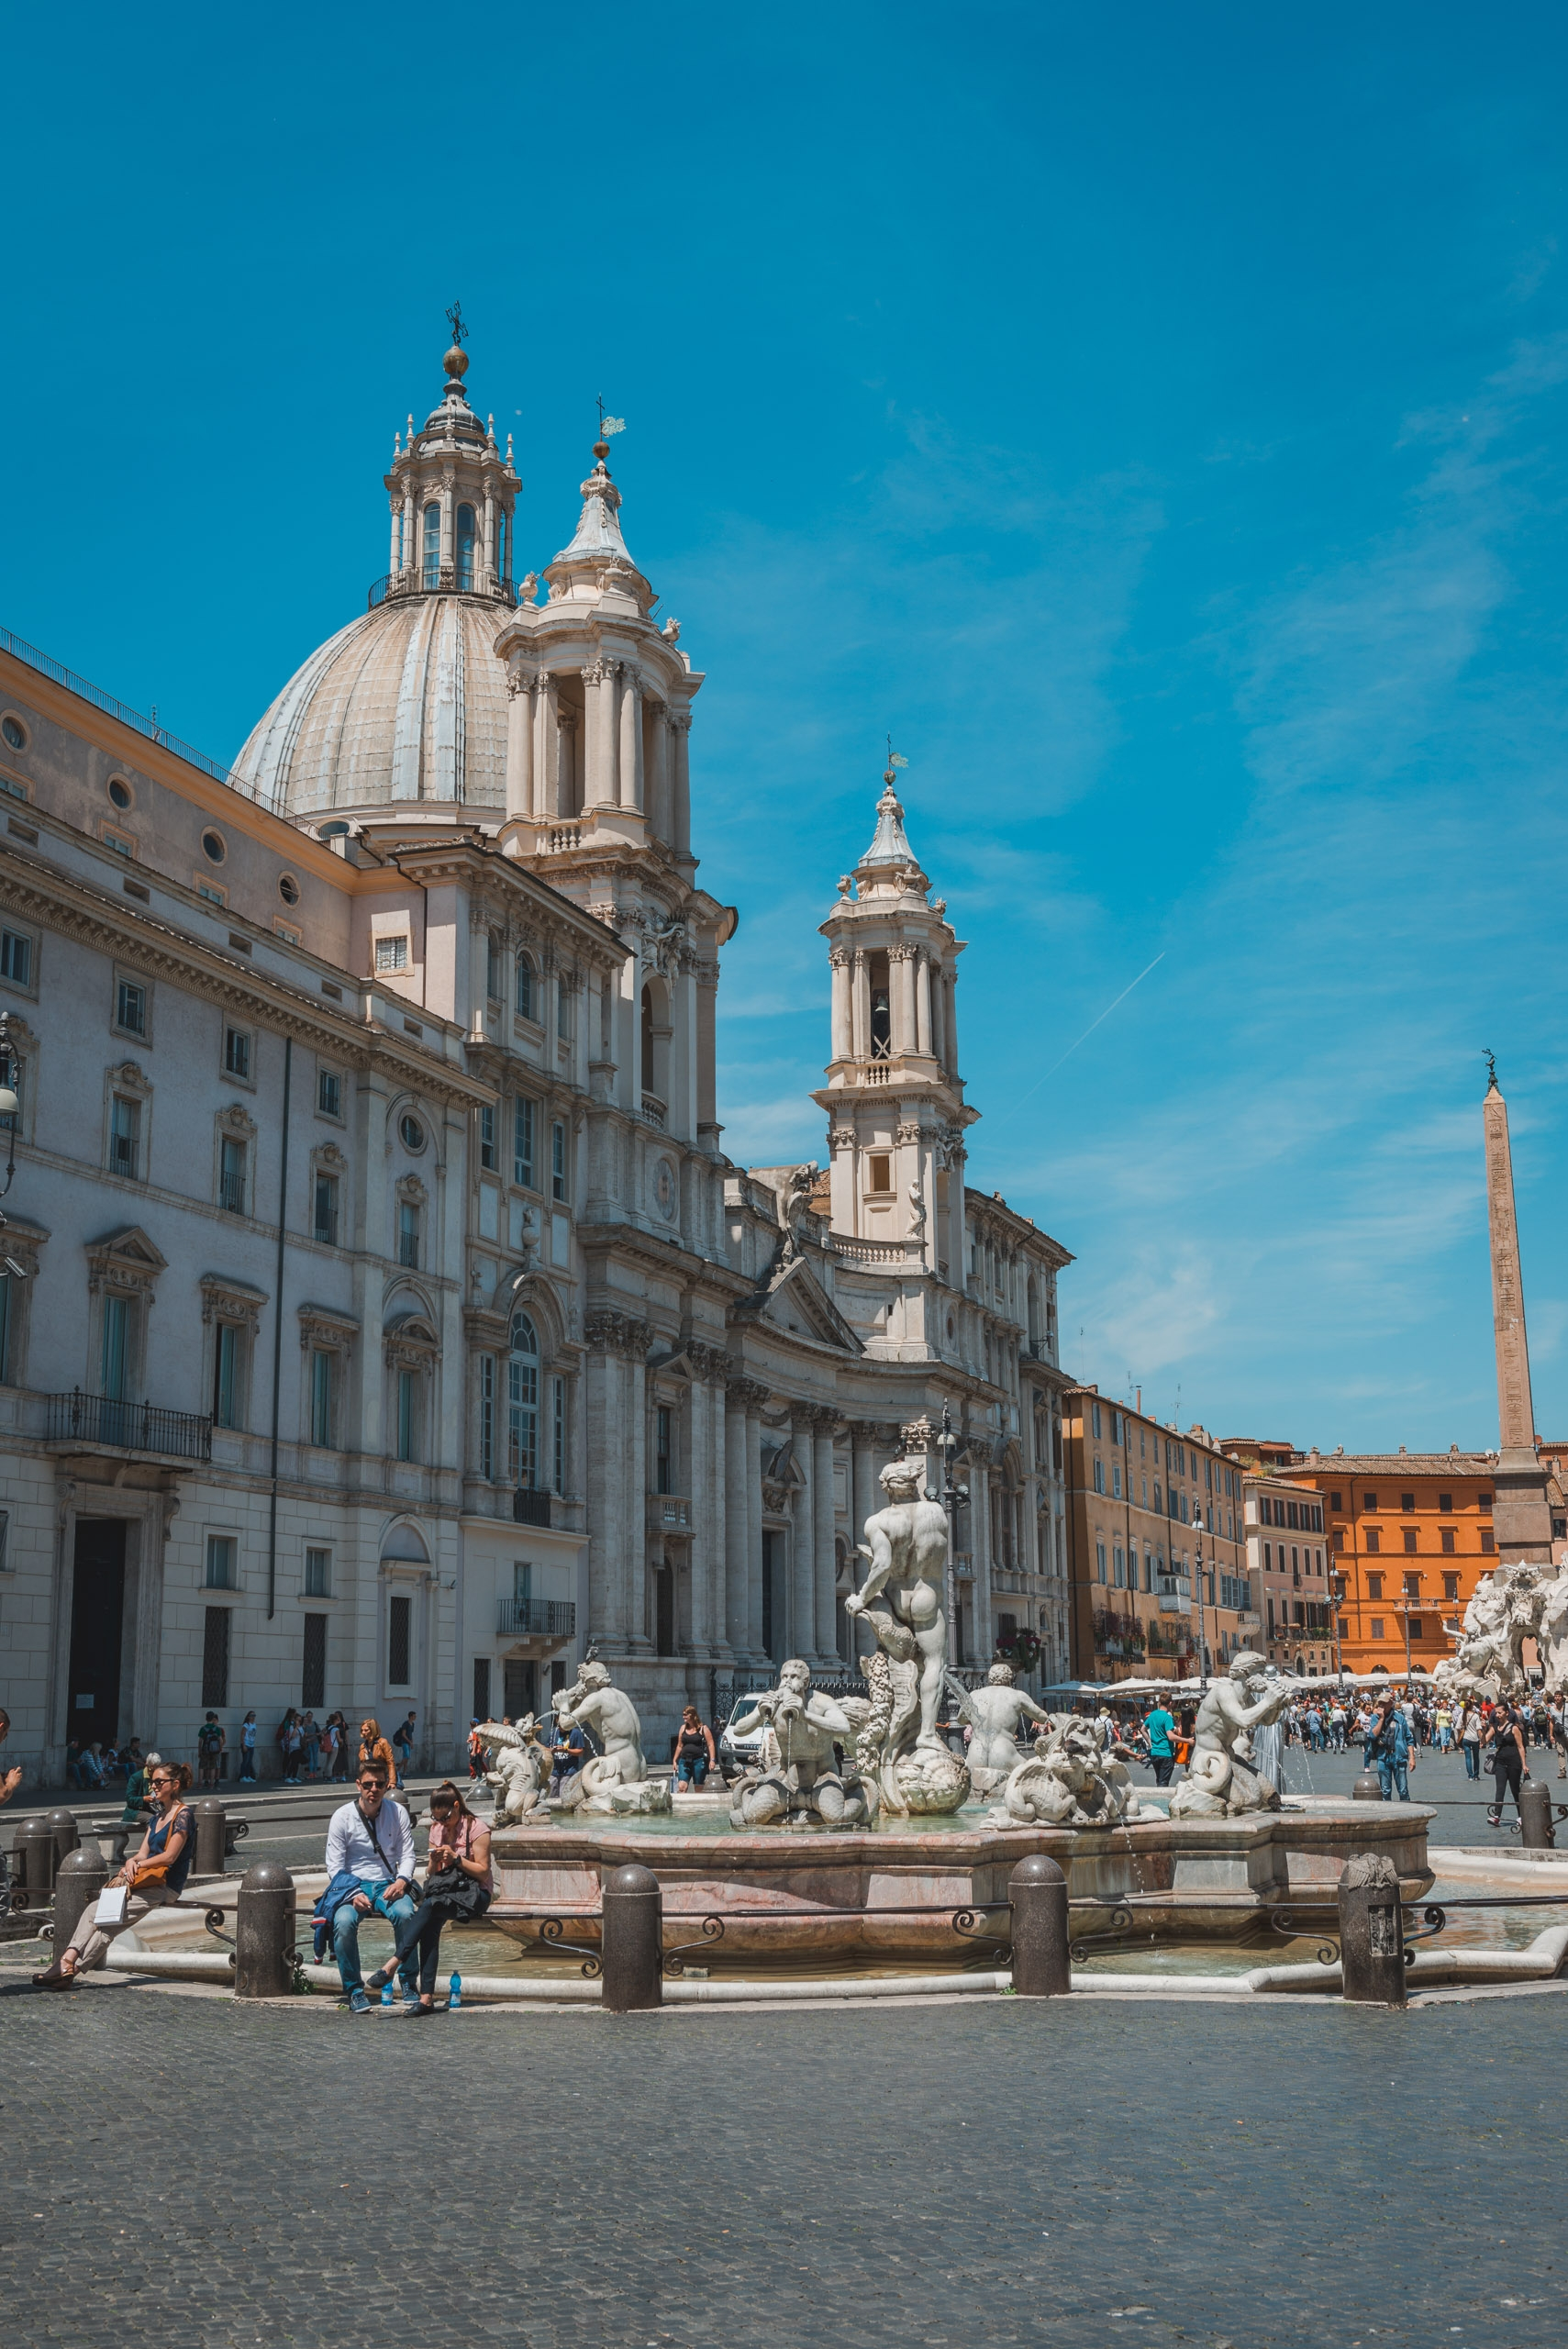 Touring Rome